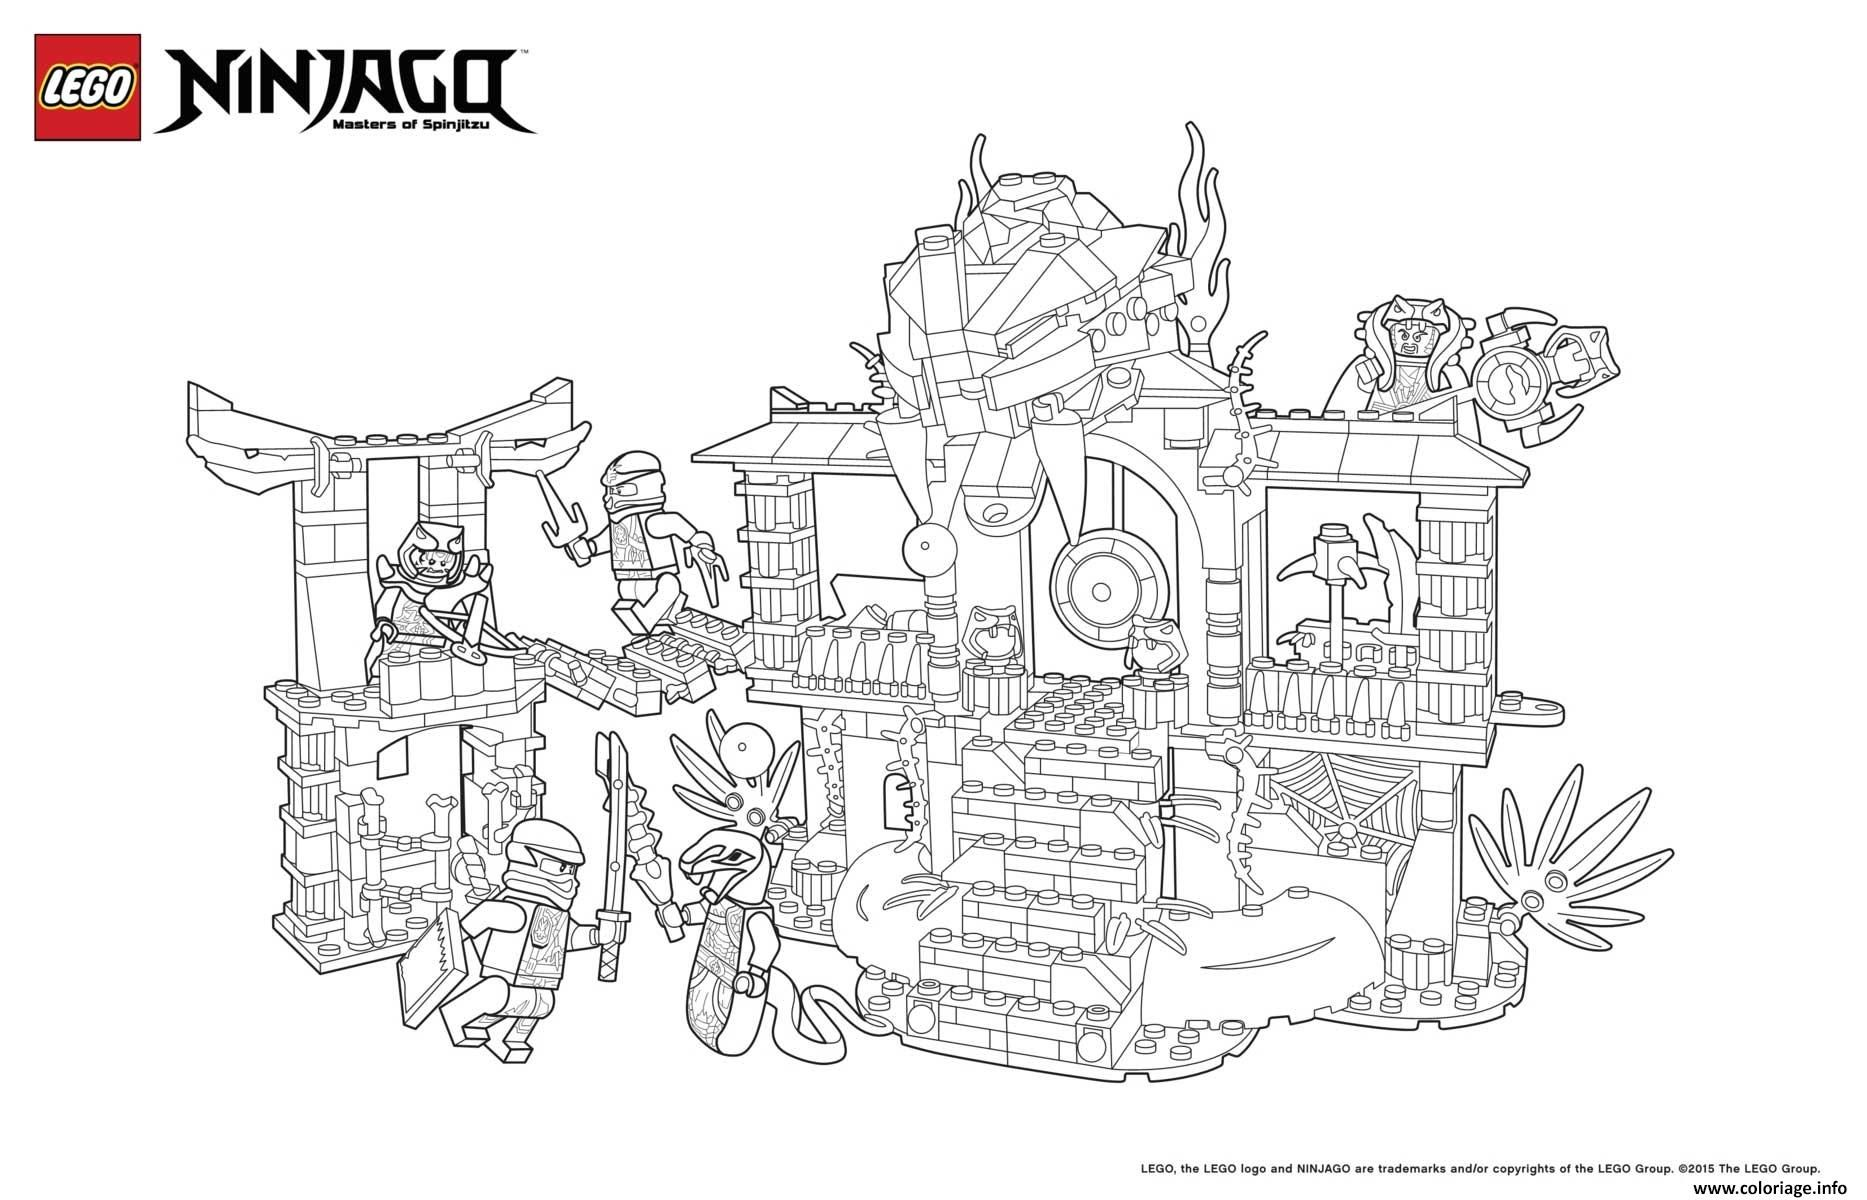 Coloriage le palais de ninjago lego Dessin à Imprimer ...